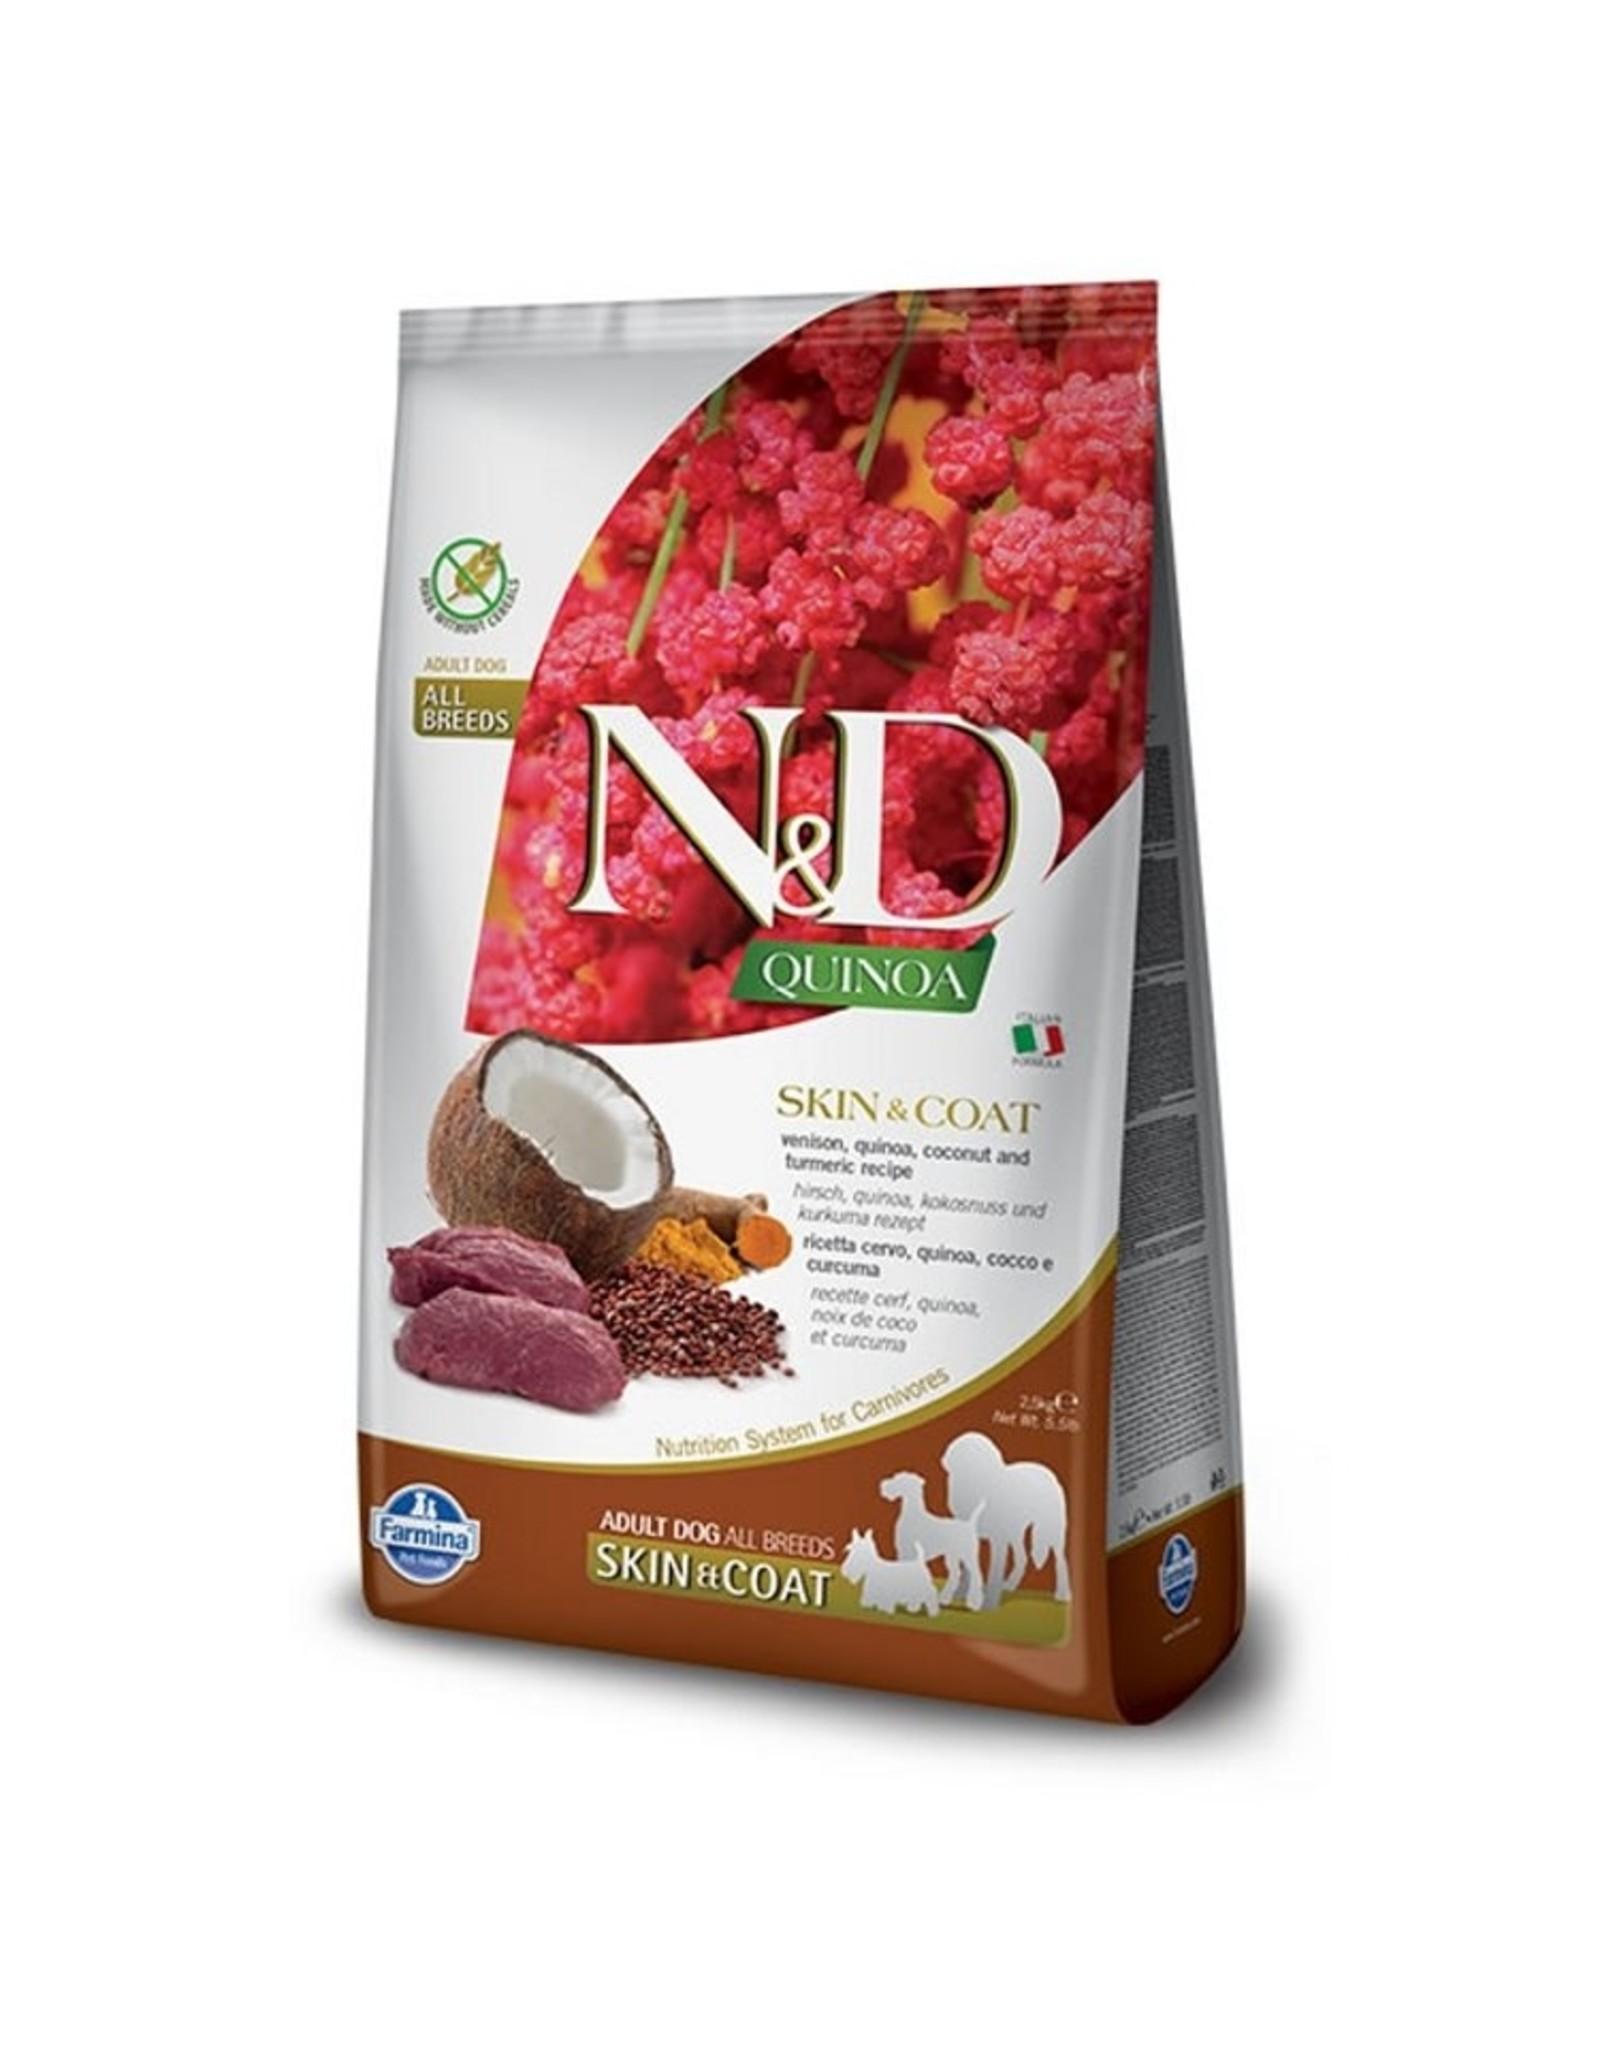 Farmina N&D Dog Food Skin & Coat Venison Quinoa 15.4#